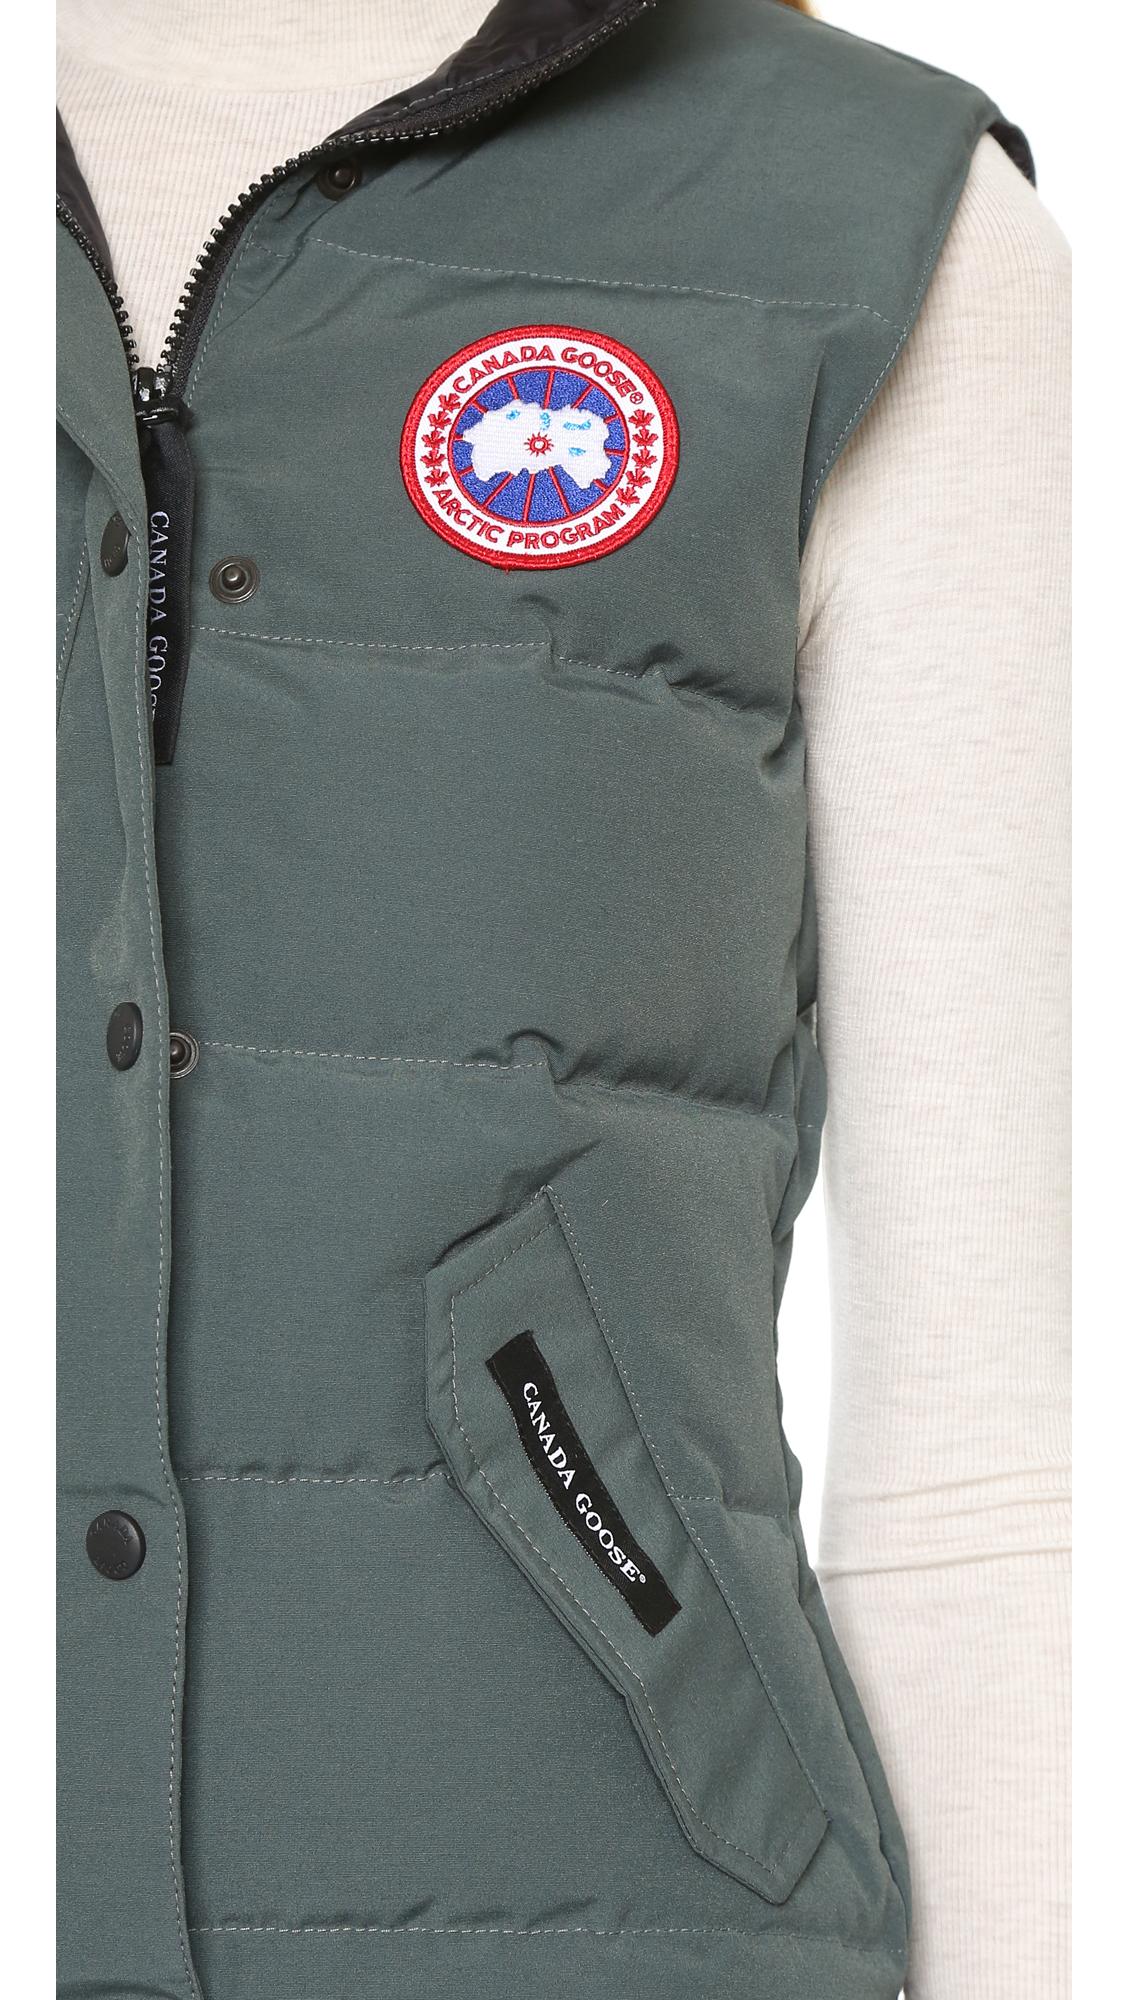 Canada Goose trillium parka sale discounts - Canada goose Freestyle Vest in Gray (Slate) | Lyst